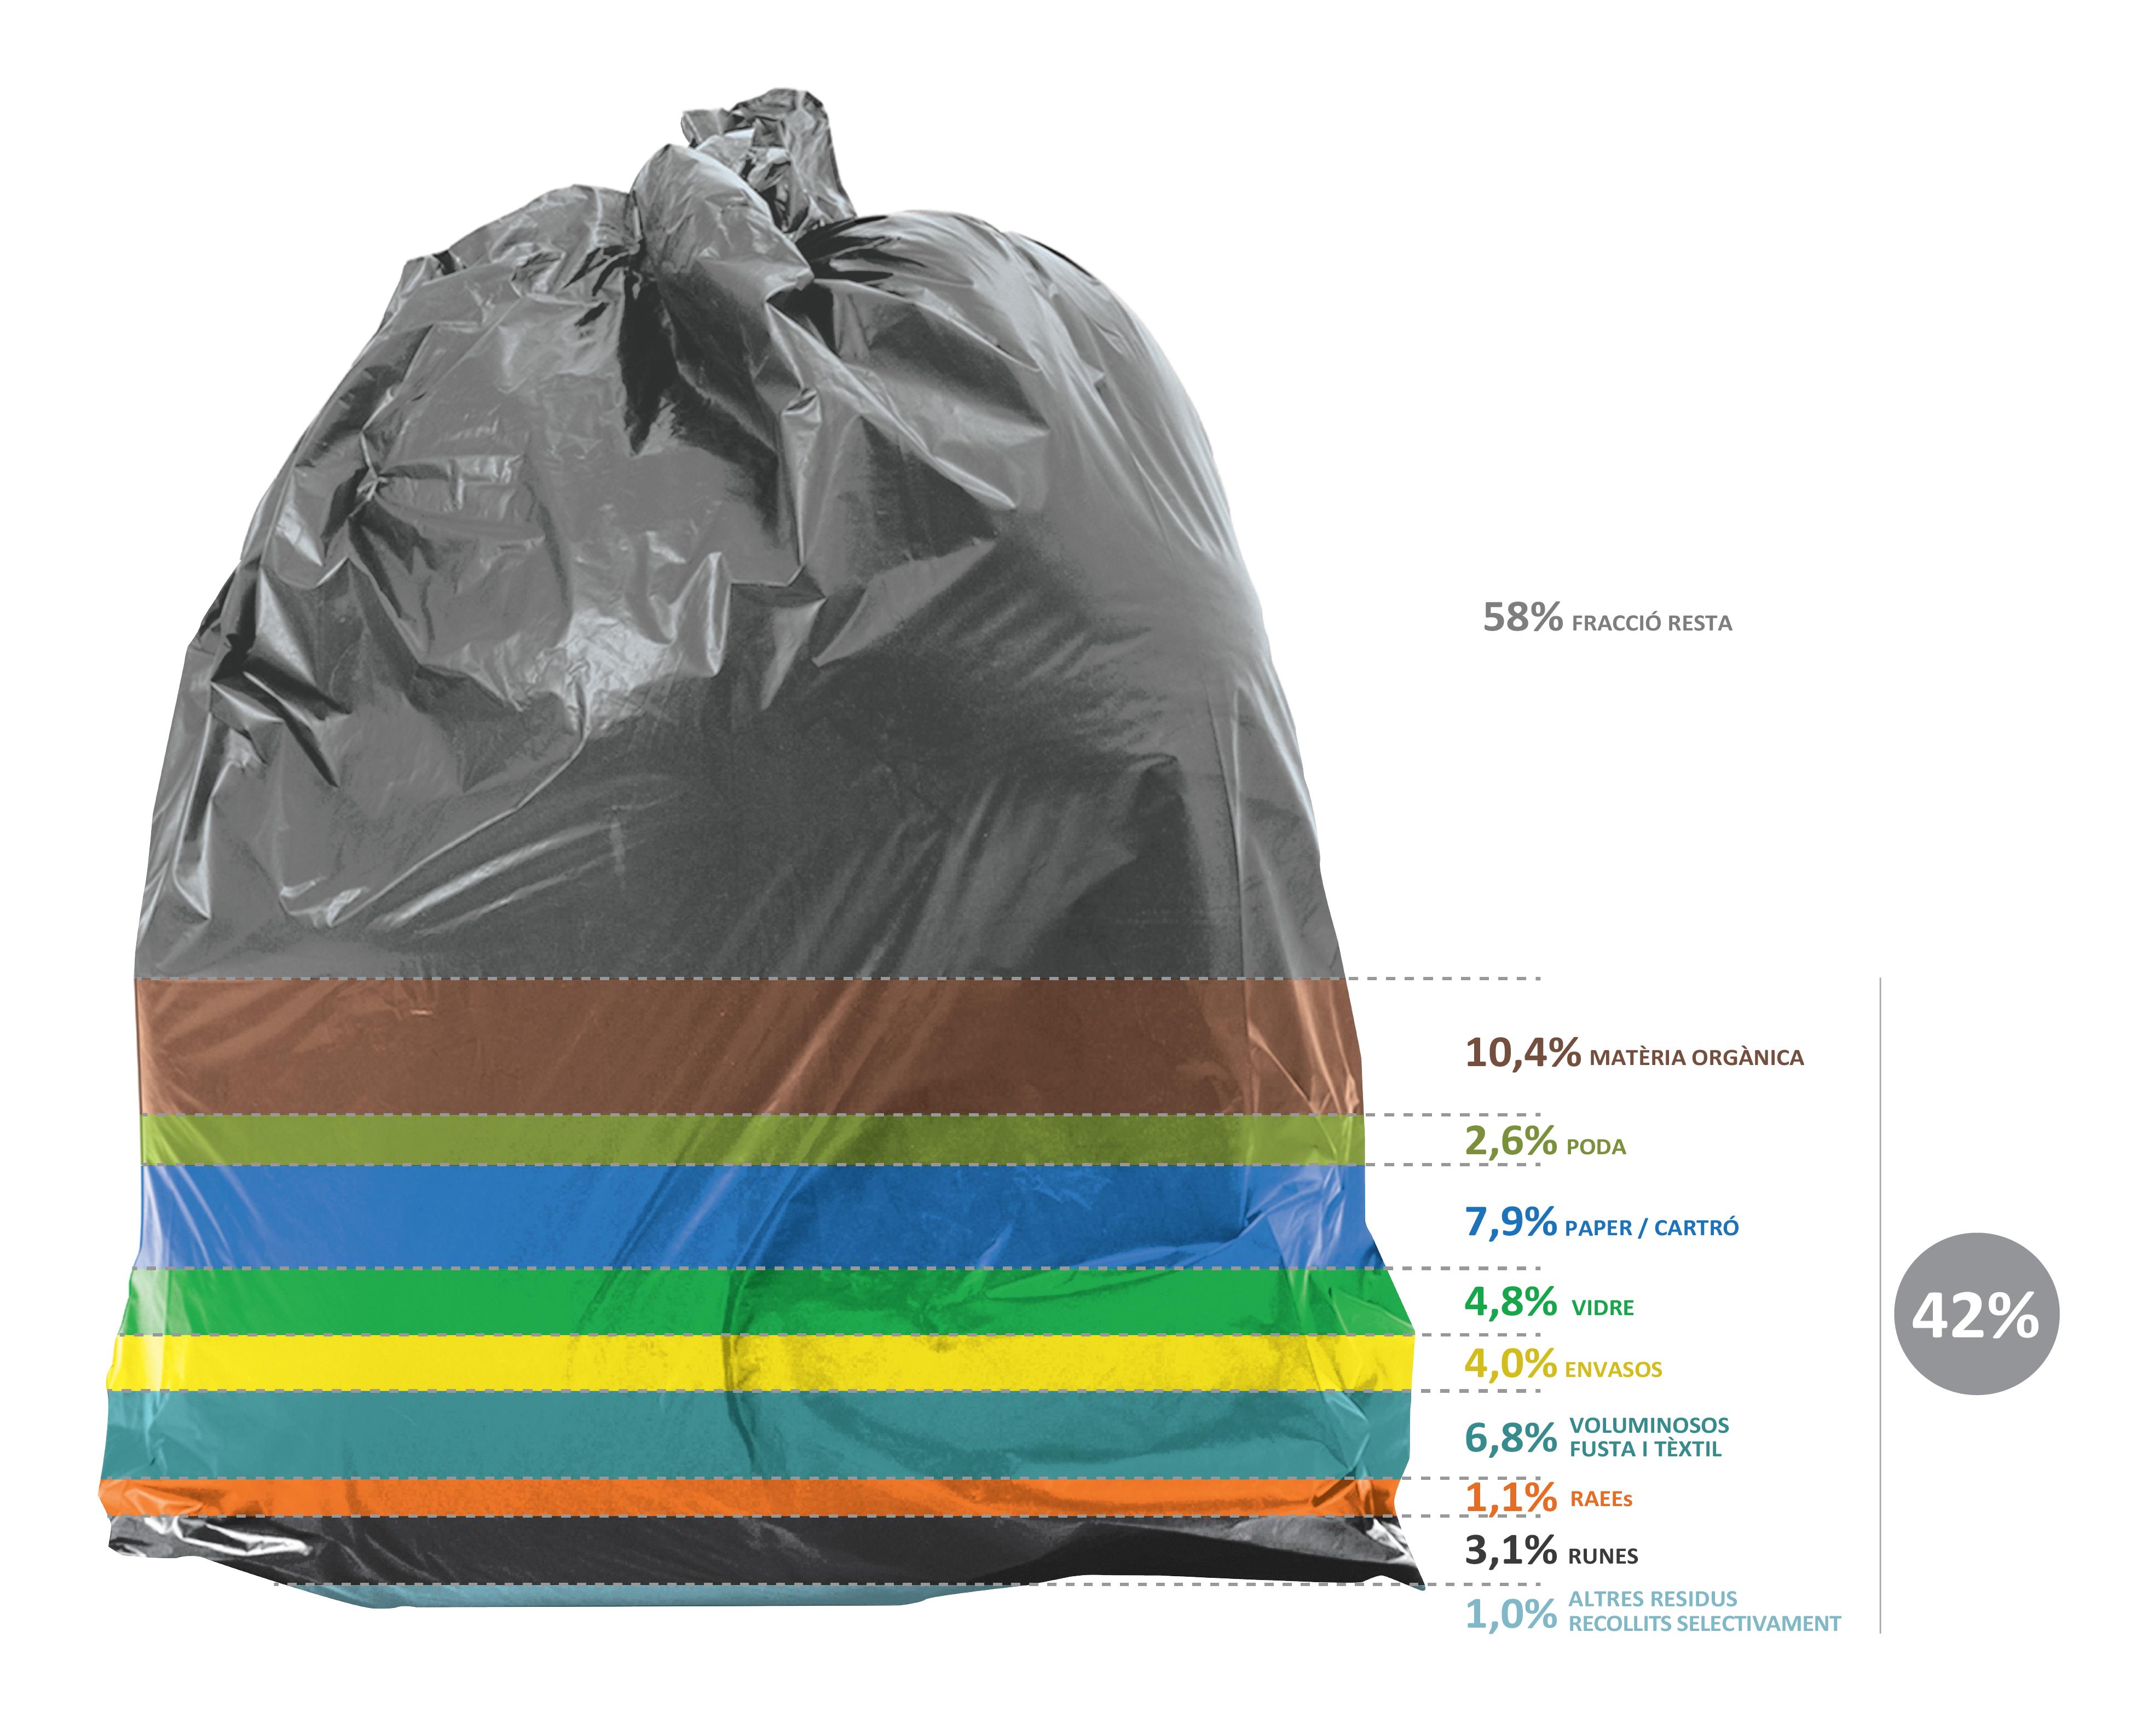 Grafic bolsa|bolso basura|maleza